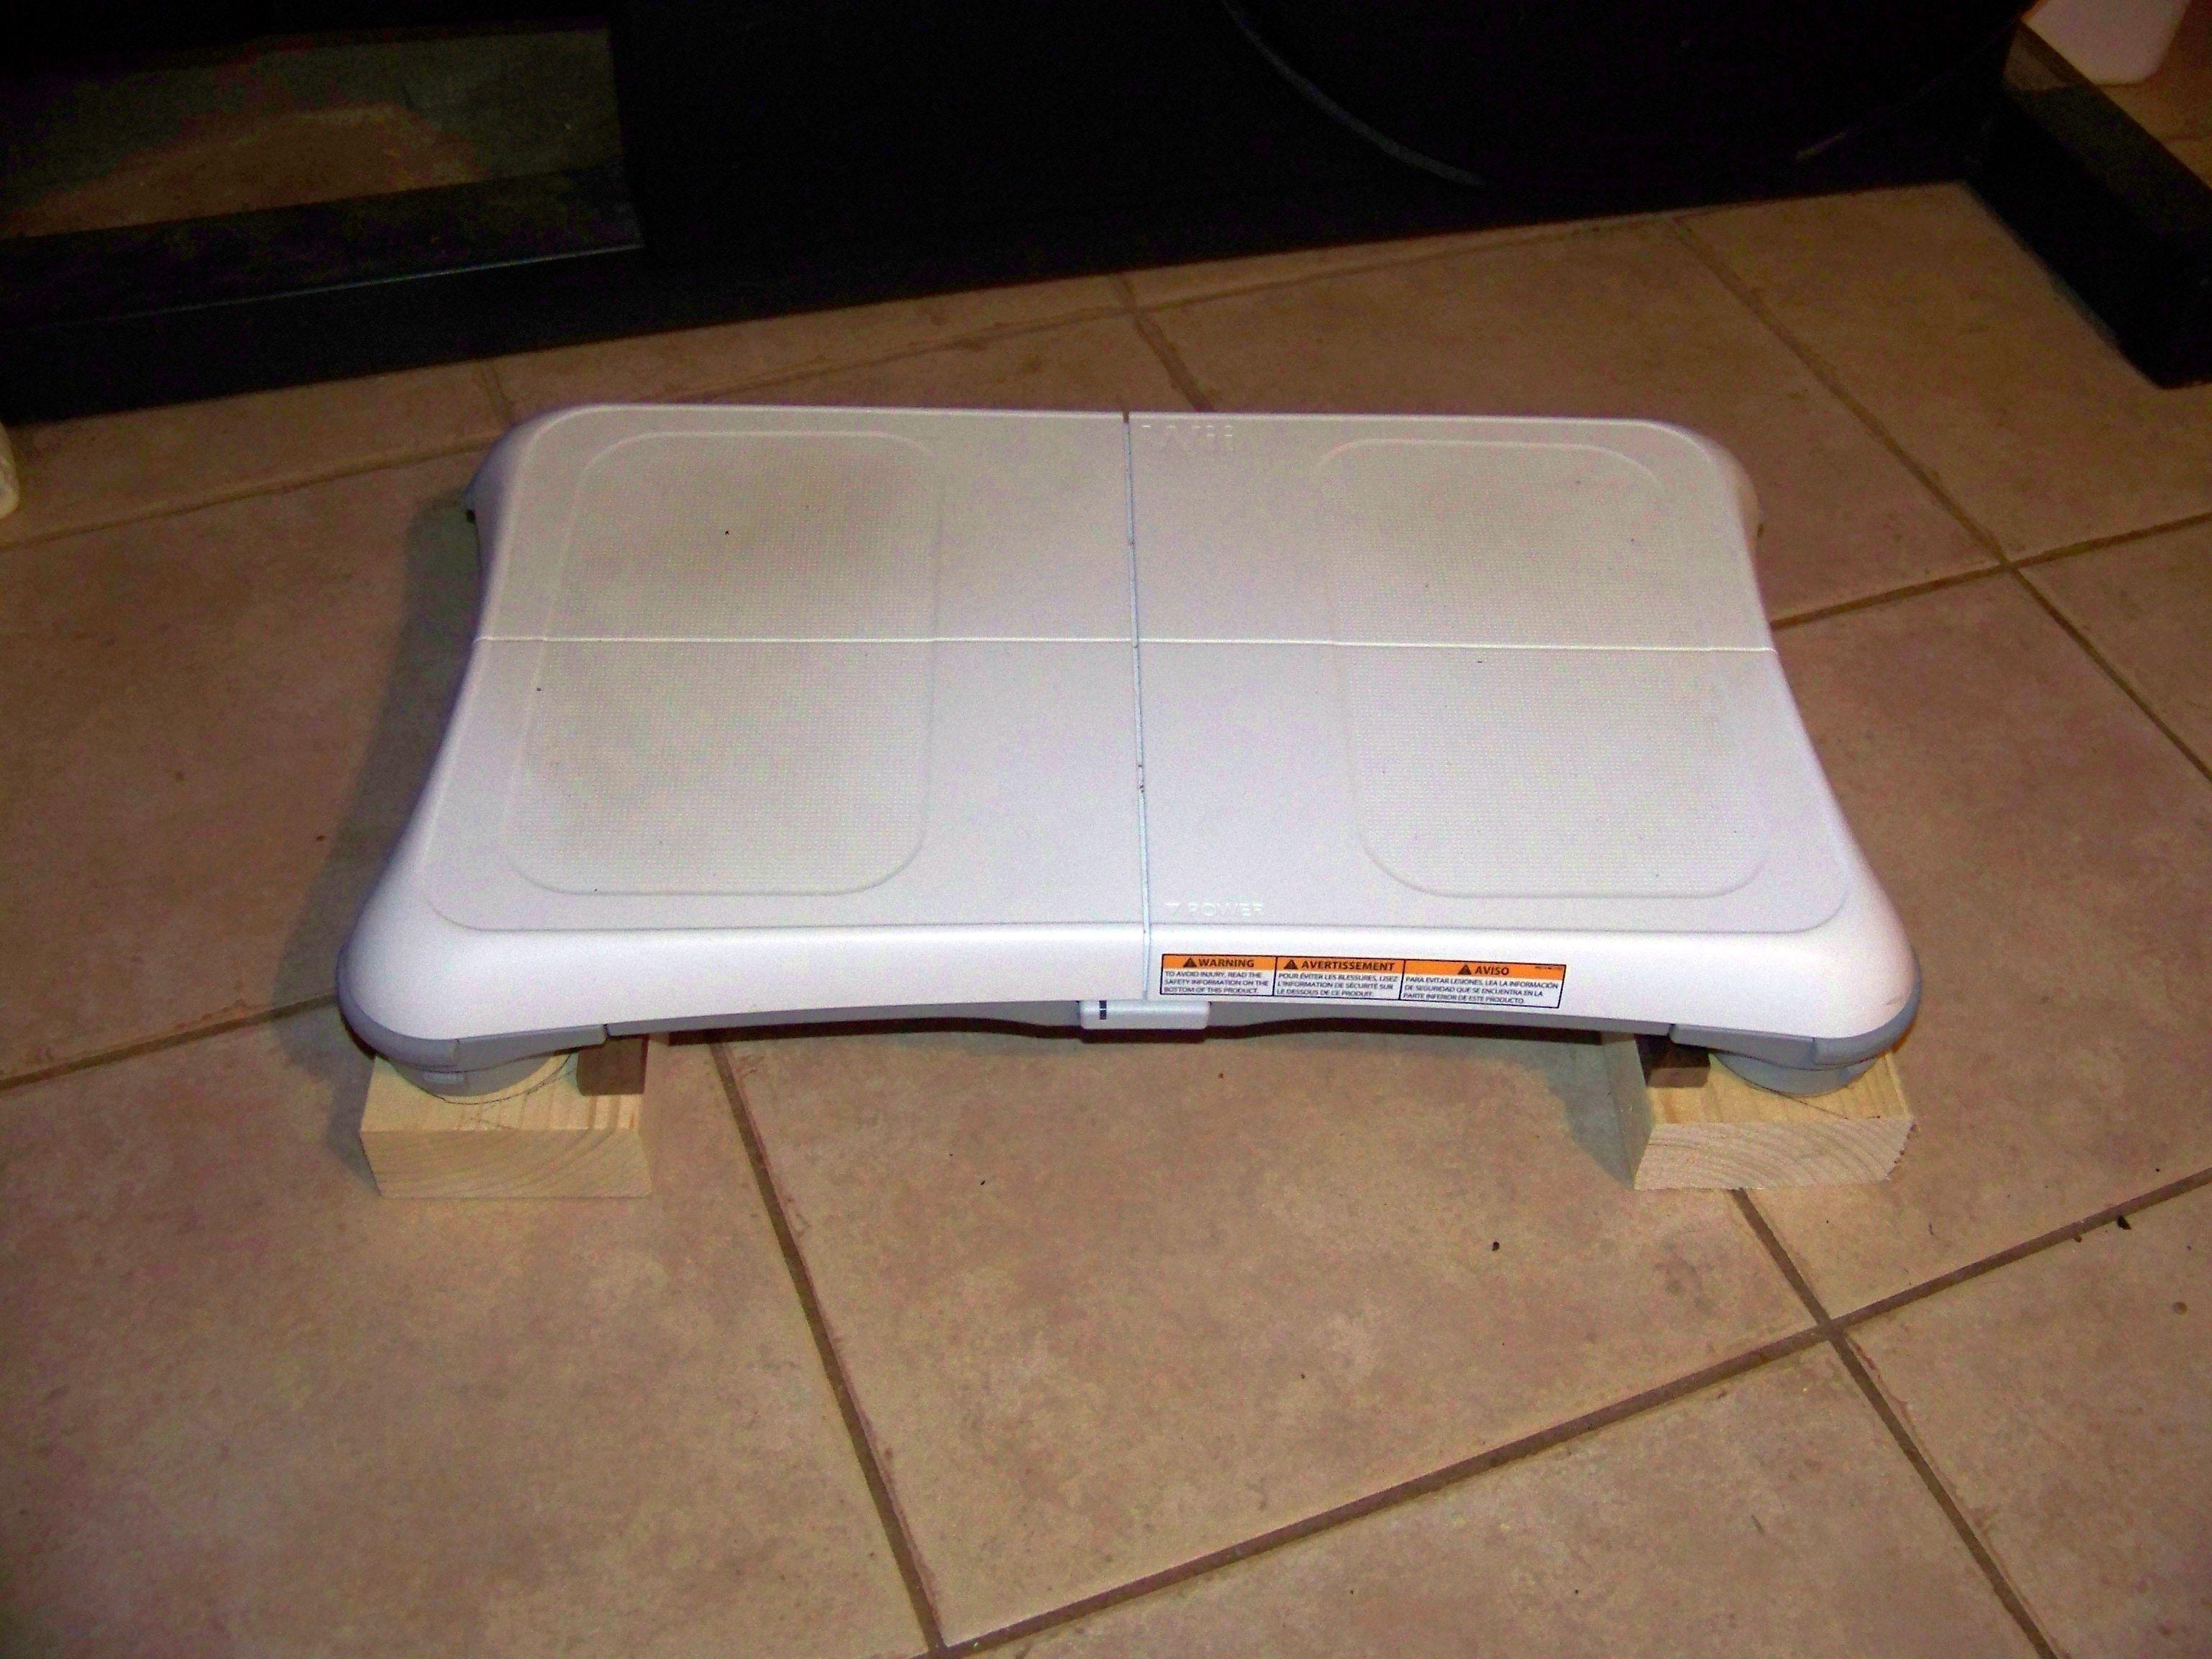 Wii Fit Balance Board Riser